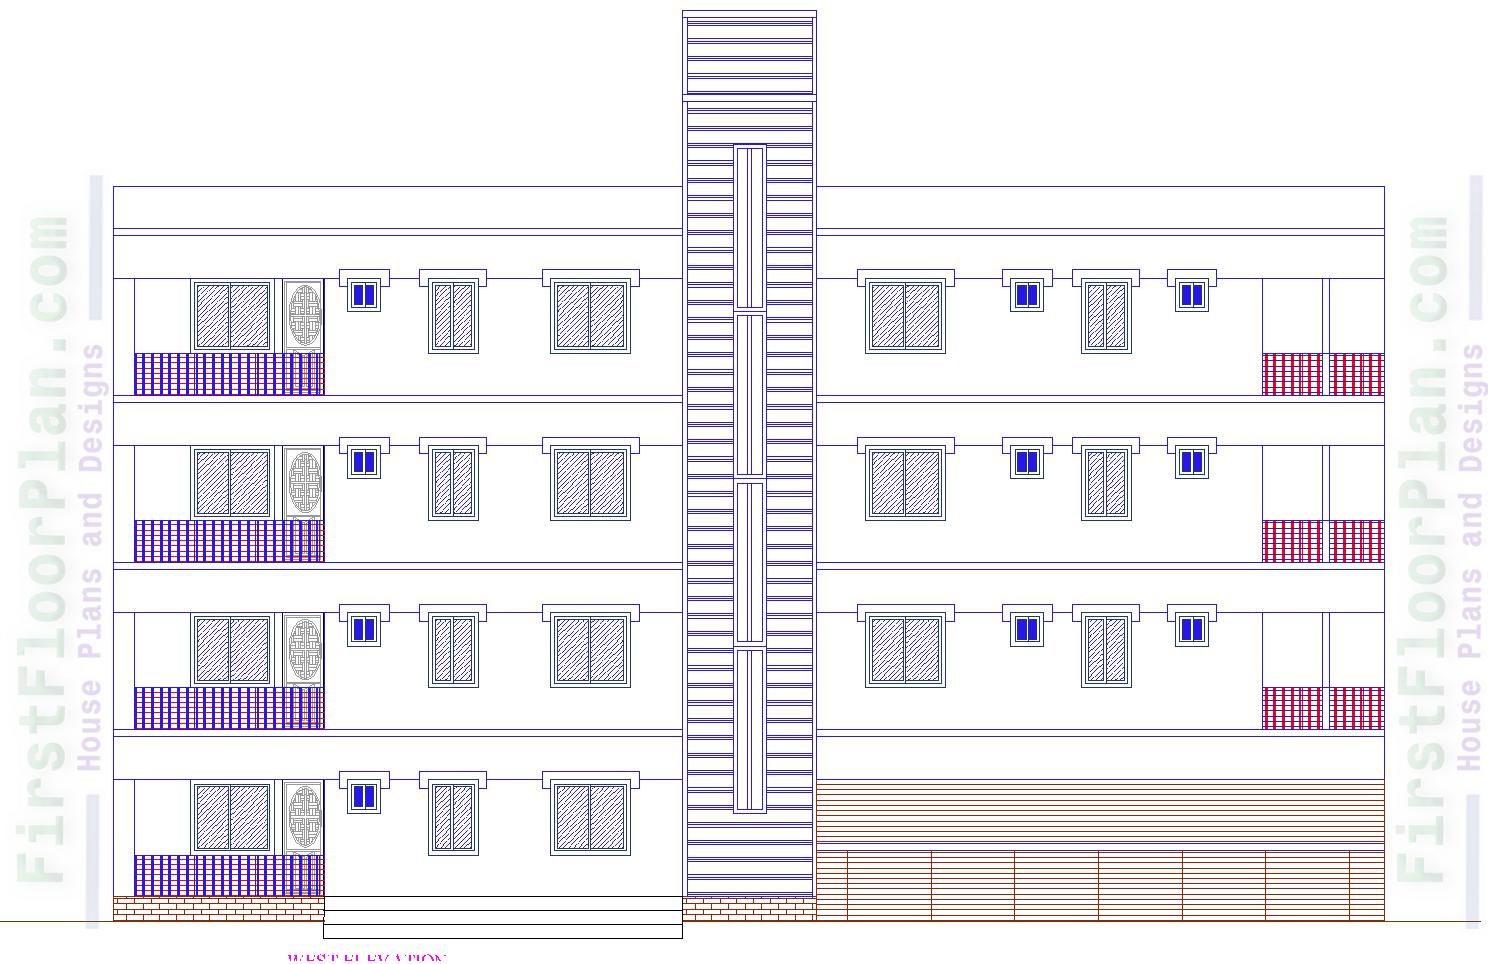 Four storey building front elevation Autocad file